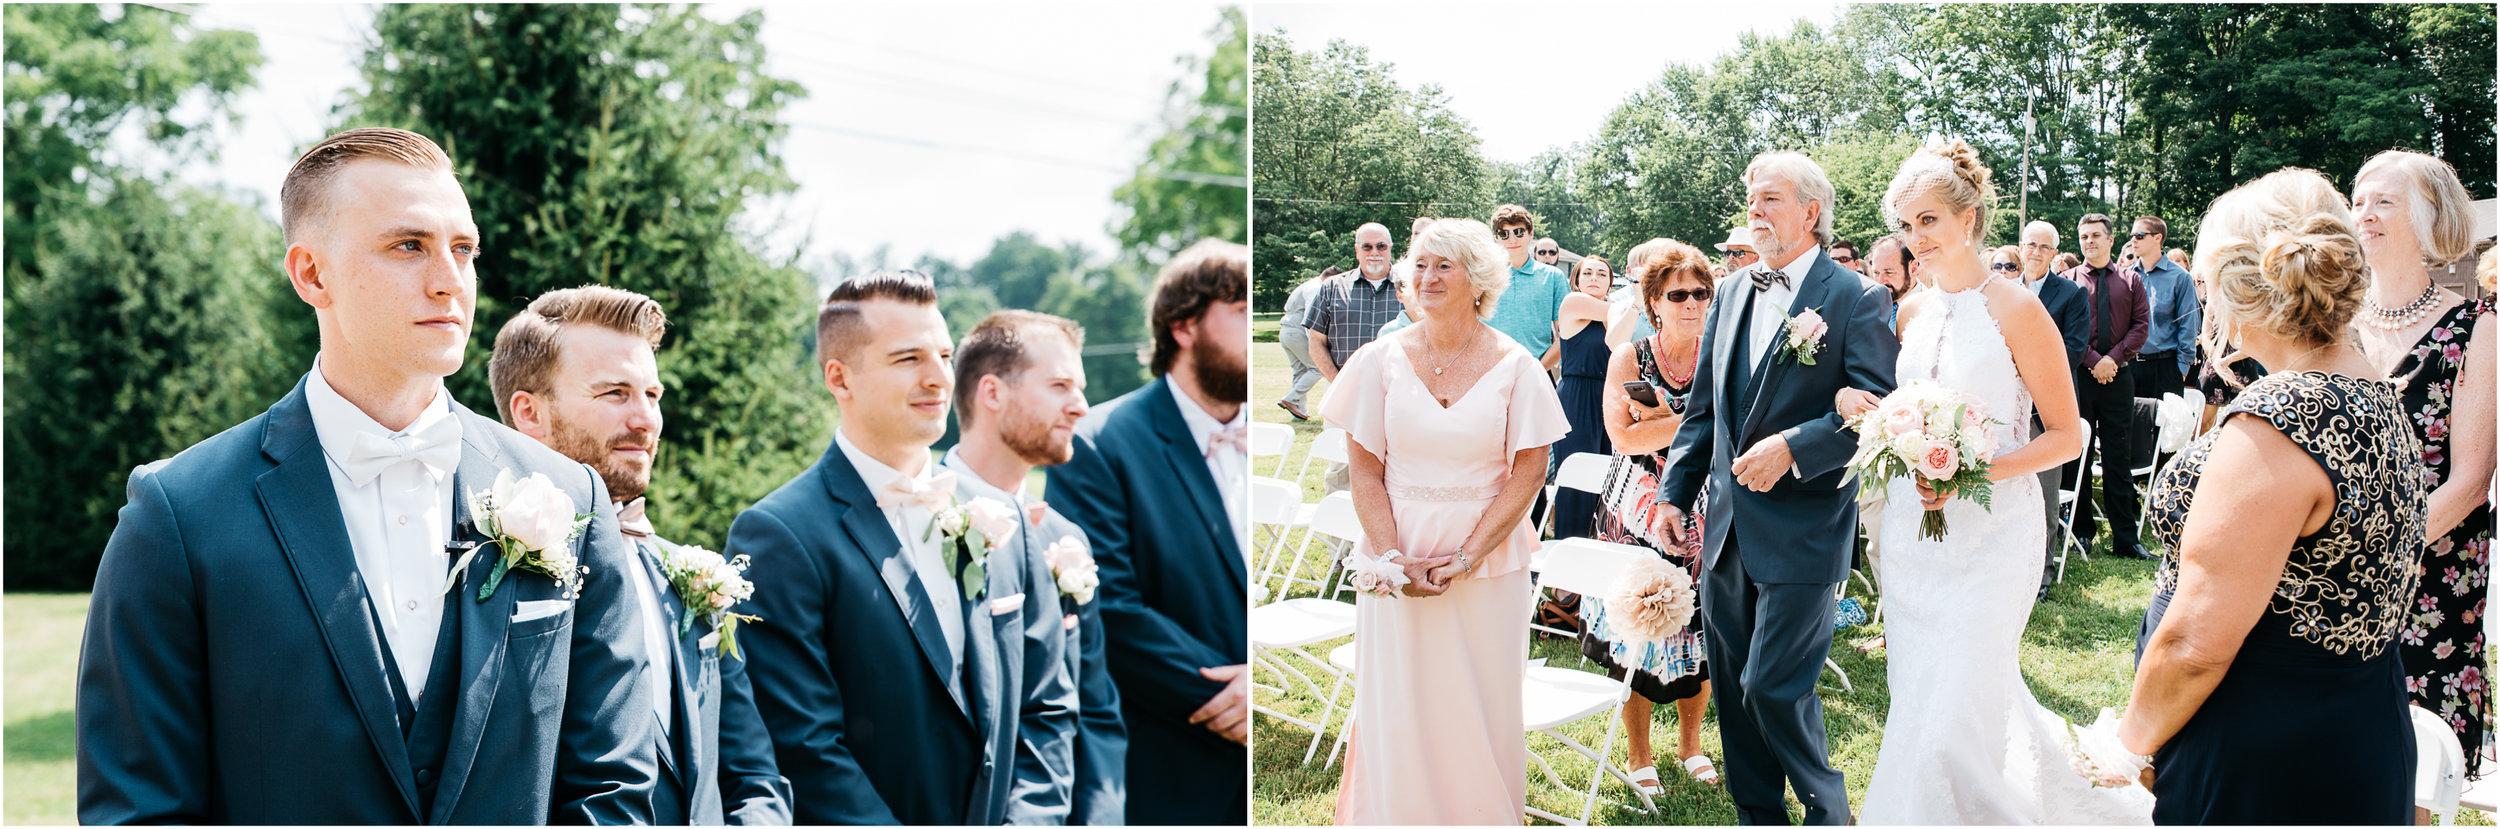 Groom seeing Bride coming down the aisle pittsburgh pa wedding photographer.jpg